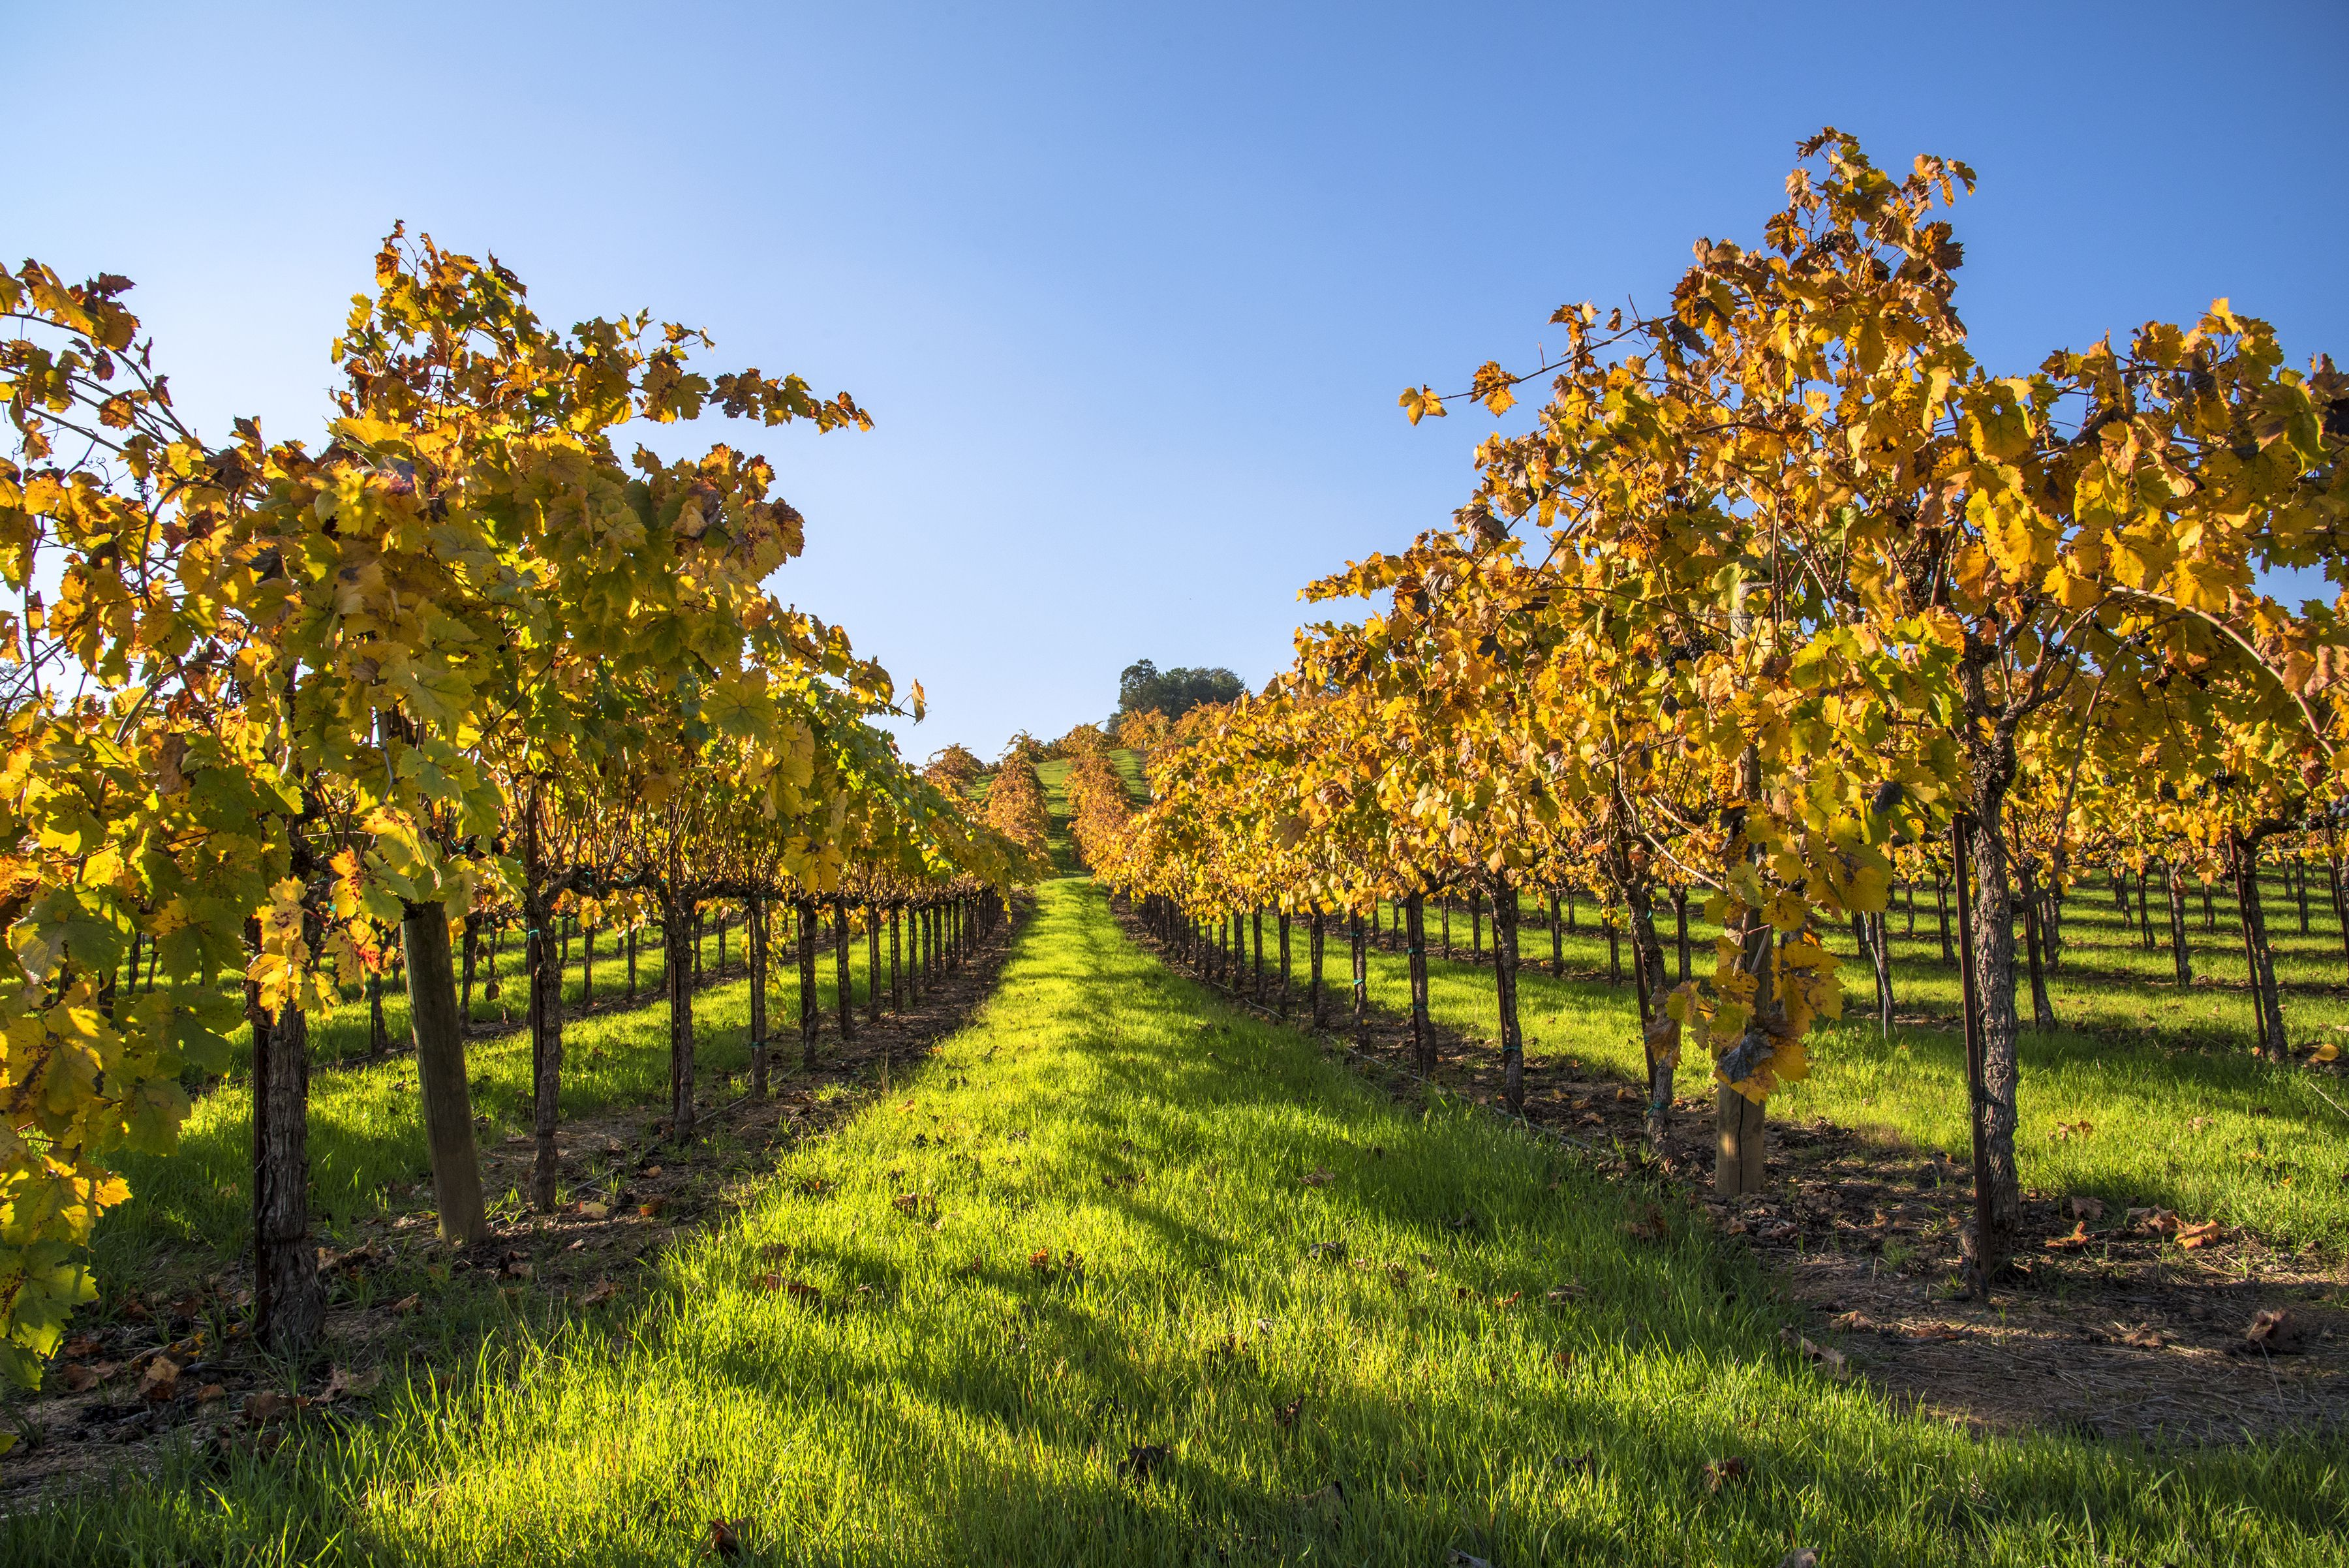 Sonoma valley vineyard in fall